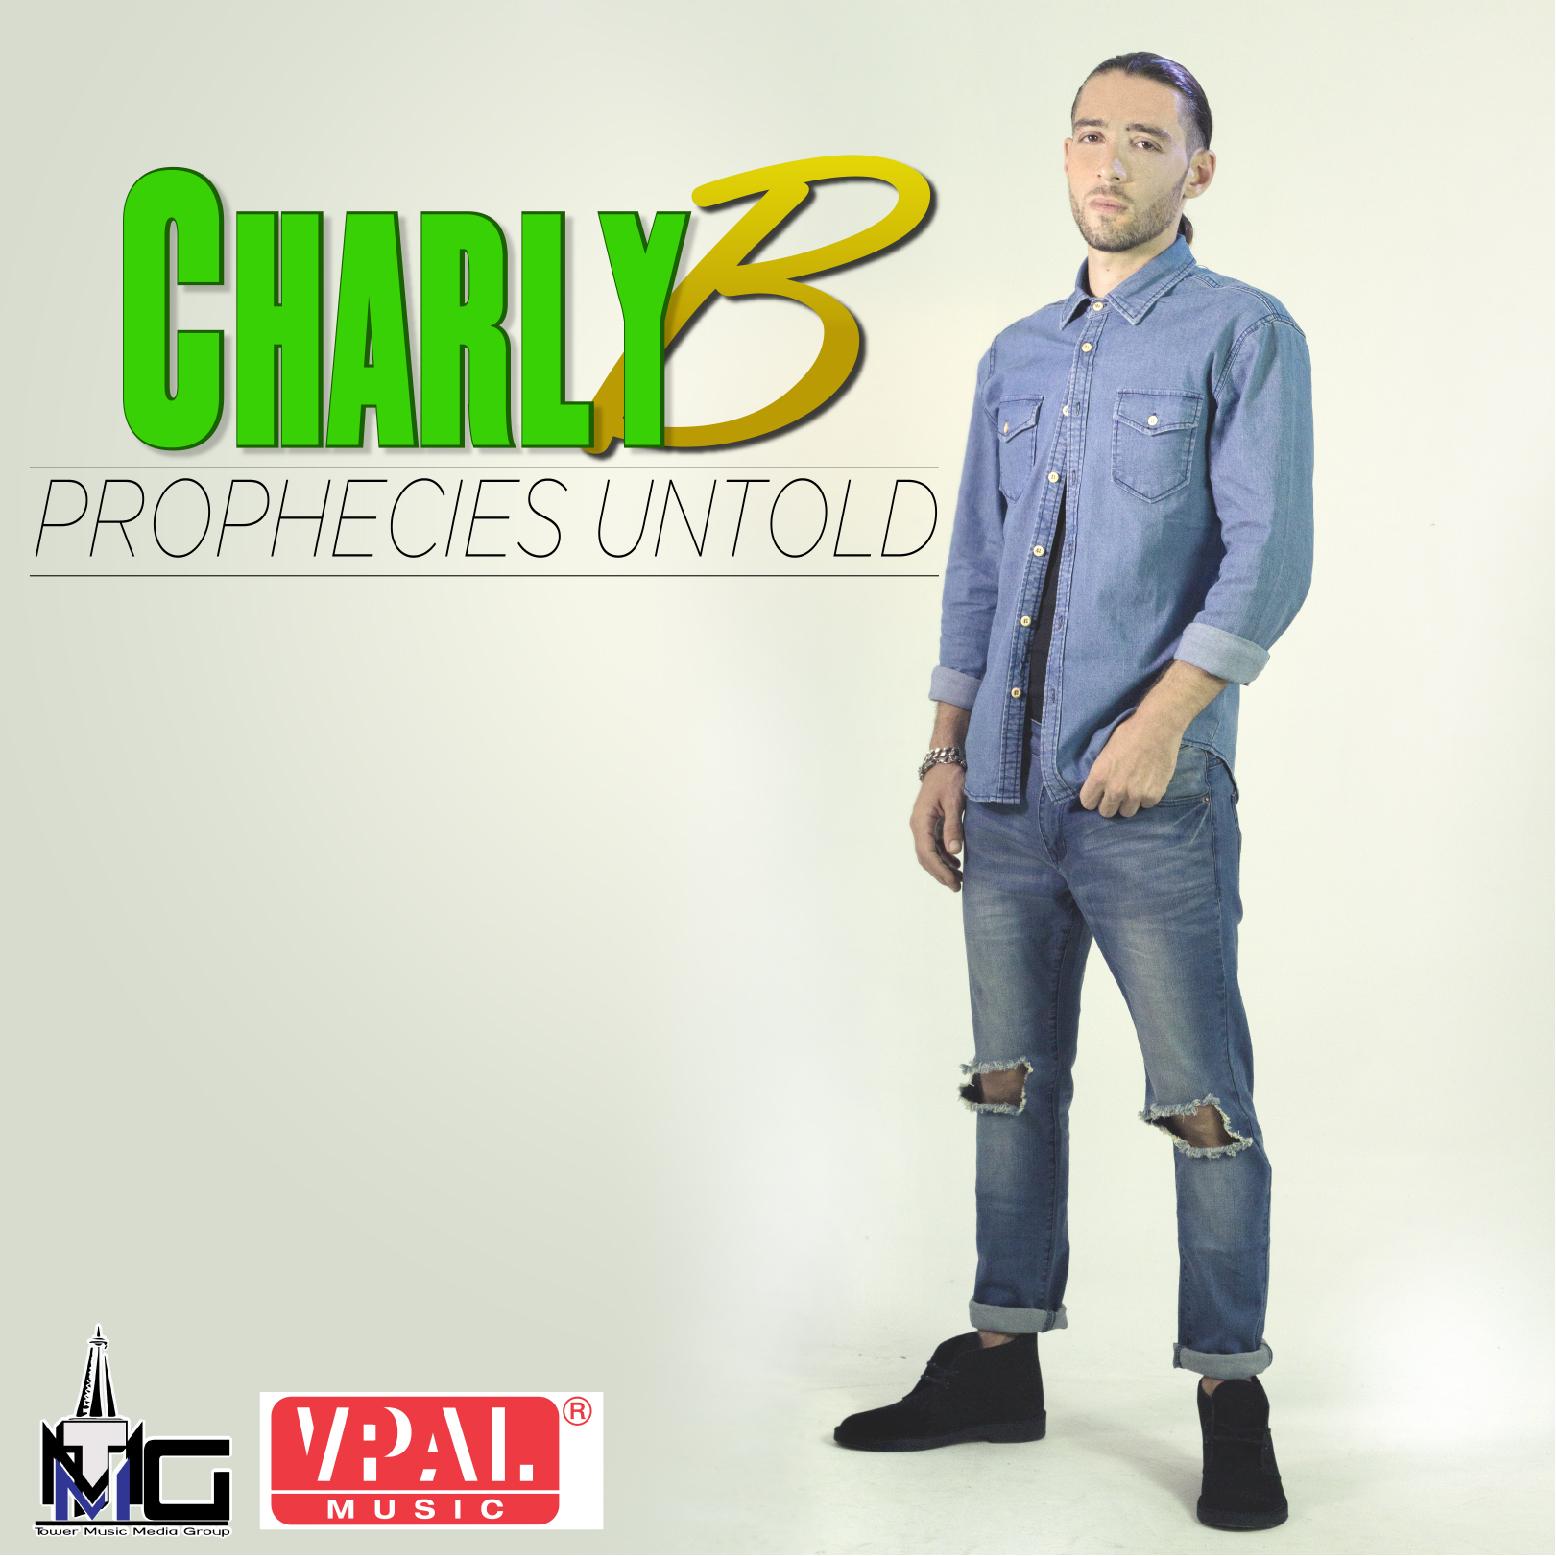 Charly B prophecies untold